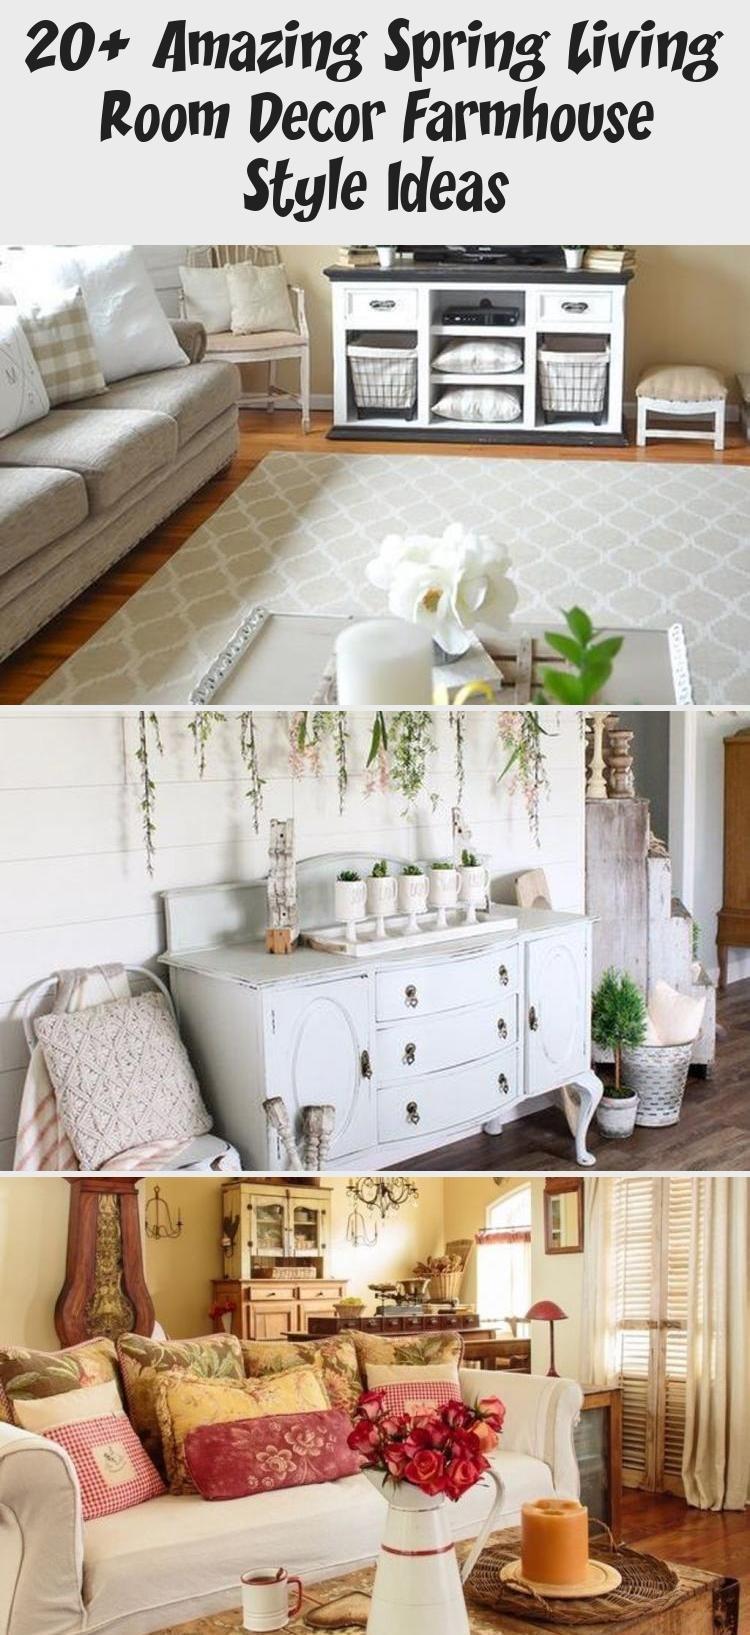 20 Amazing Spring Living Room Decor Farmhouse Style Ideas